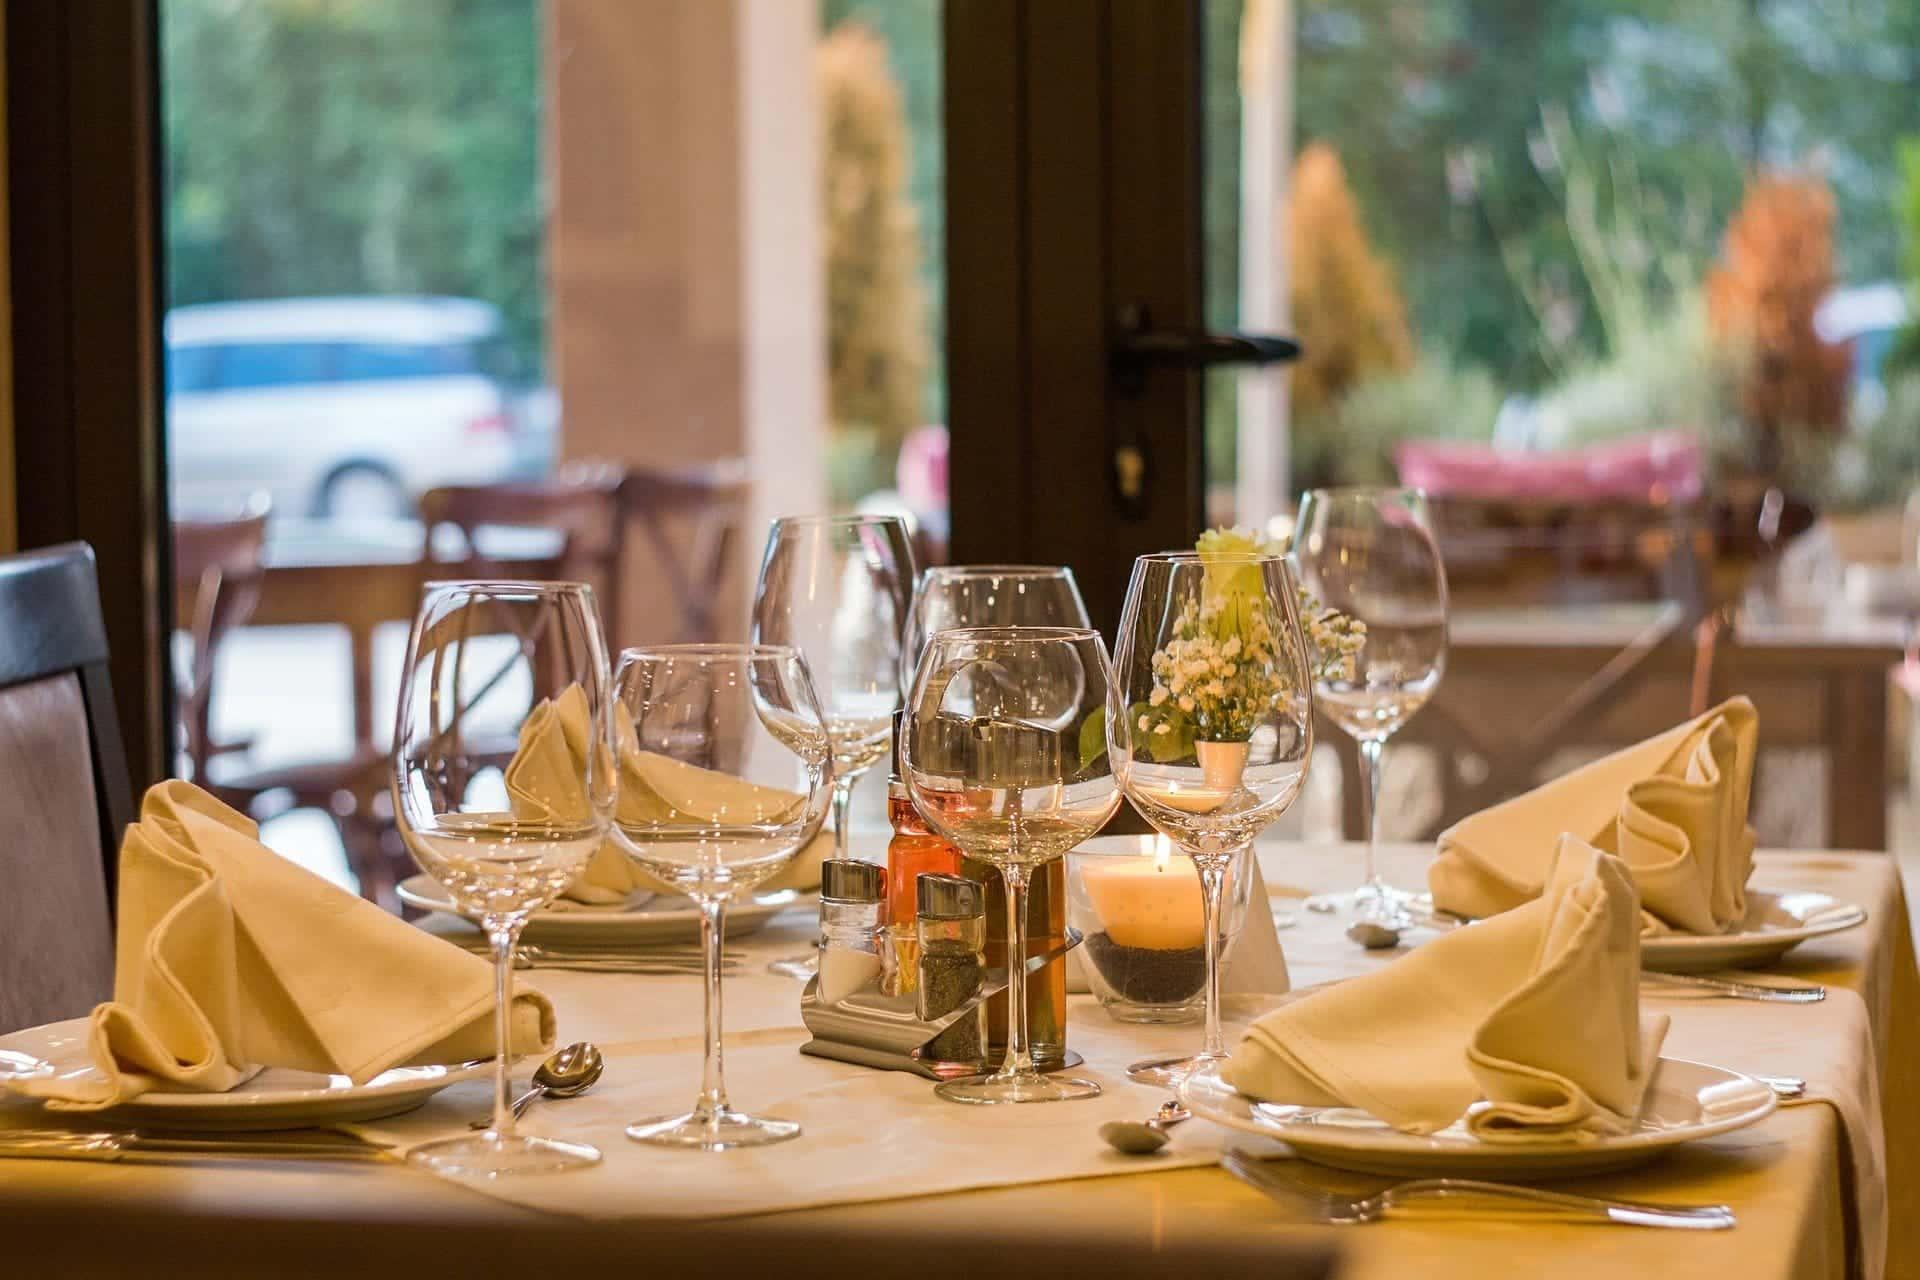 restaurant dining setup